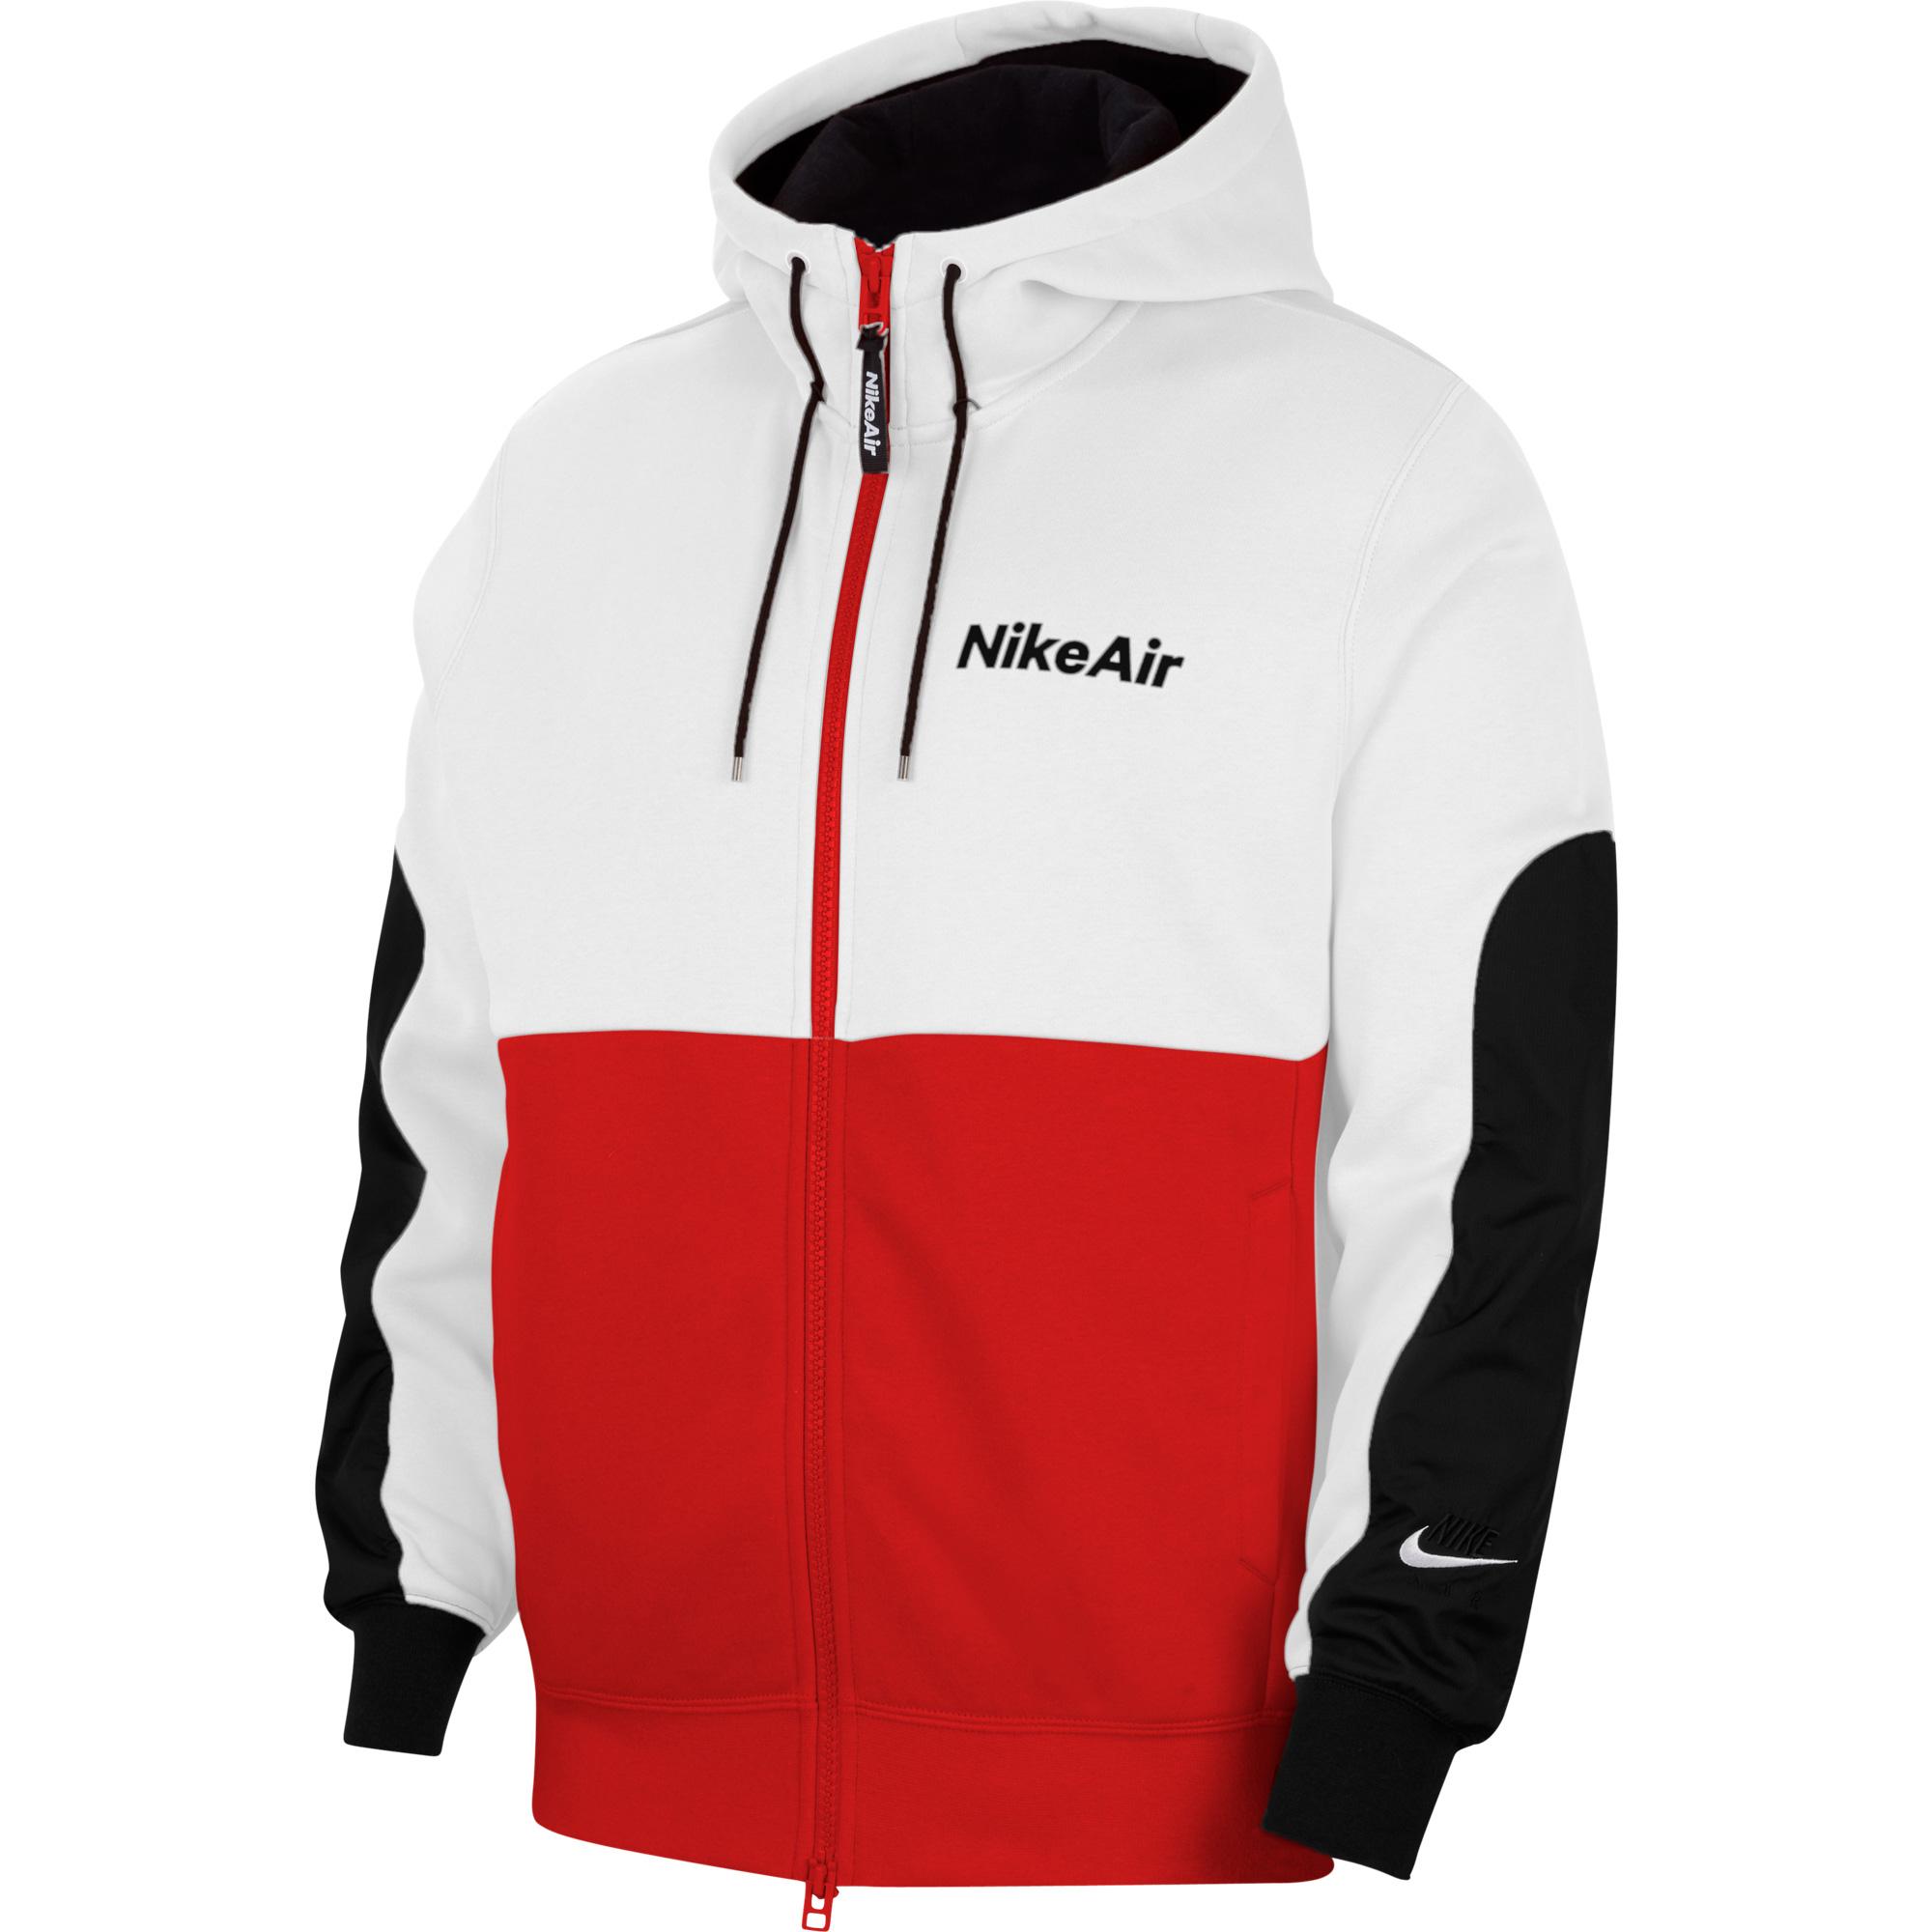 Nike Air Erkek Beyaz-Kırmızı Sweatshirt